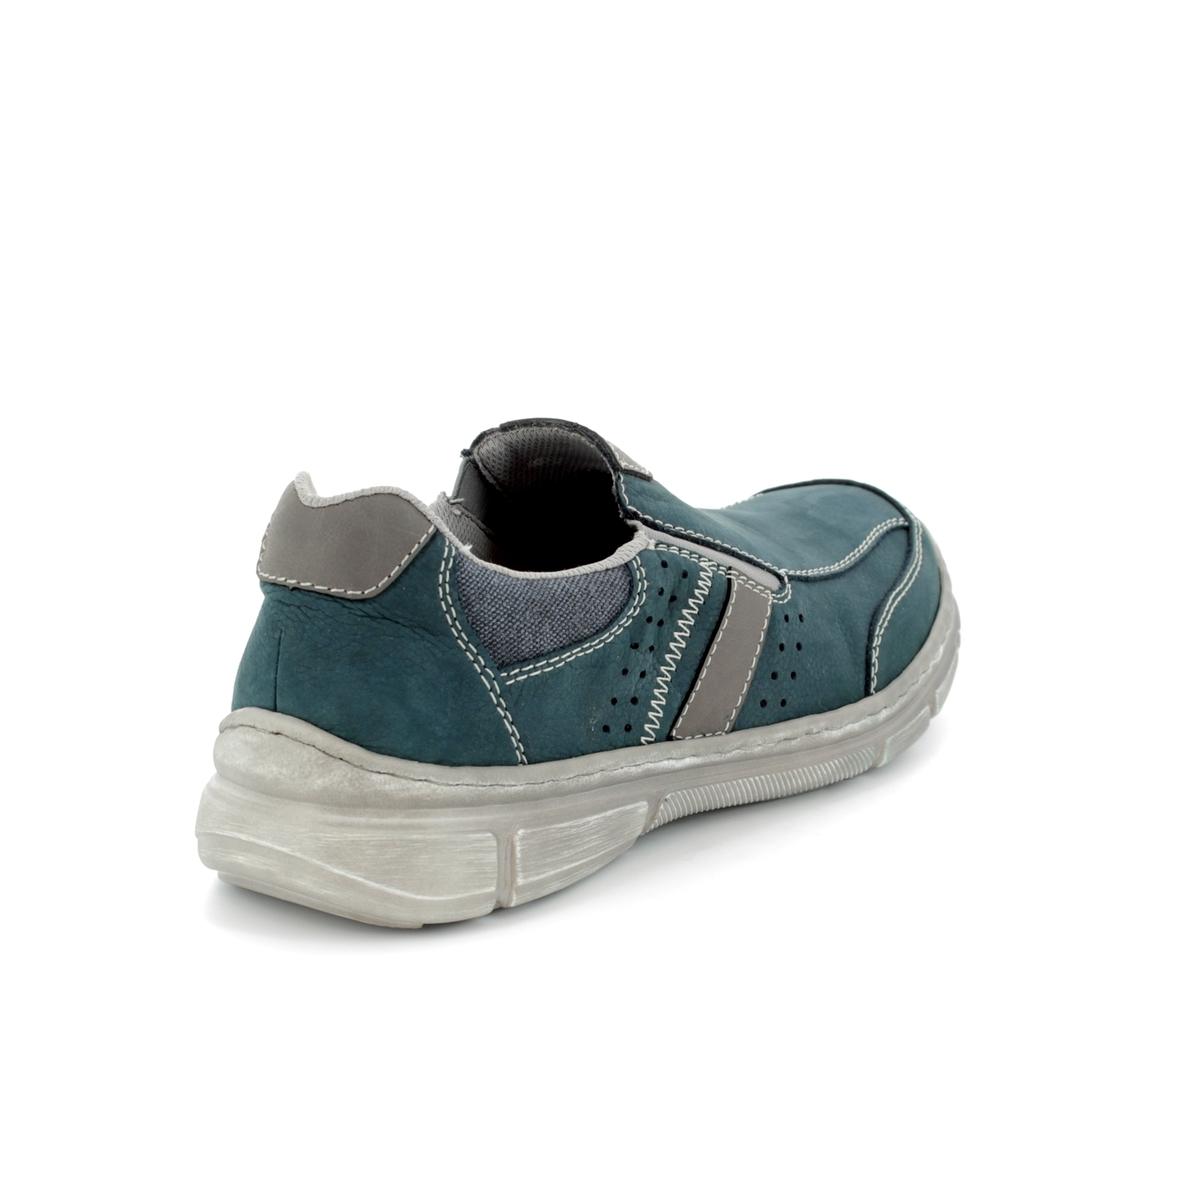 e757fbd1f7 Rieker Casual Shoes - Navy - 13752-14 JAIPUR